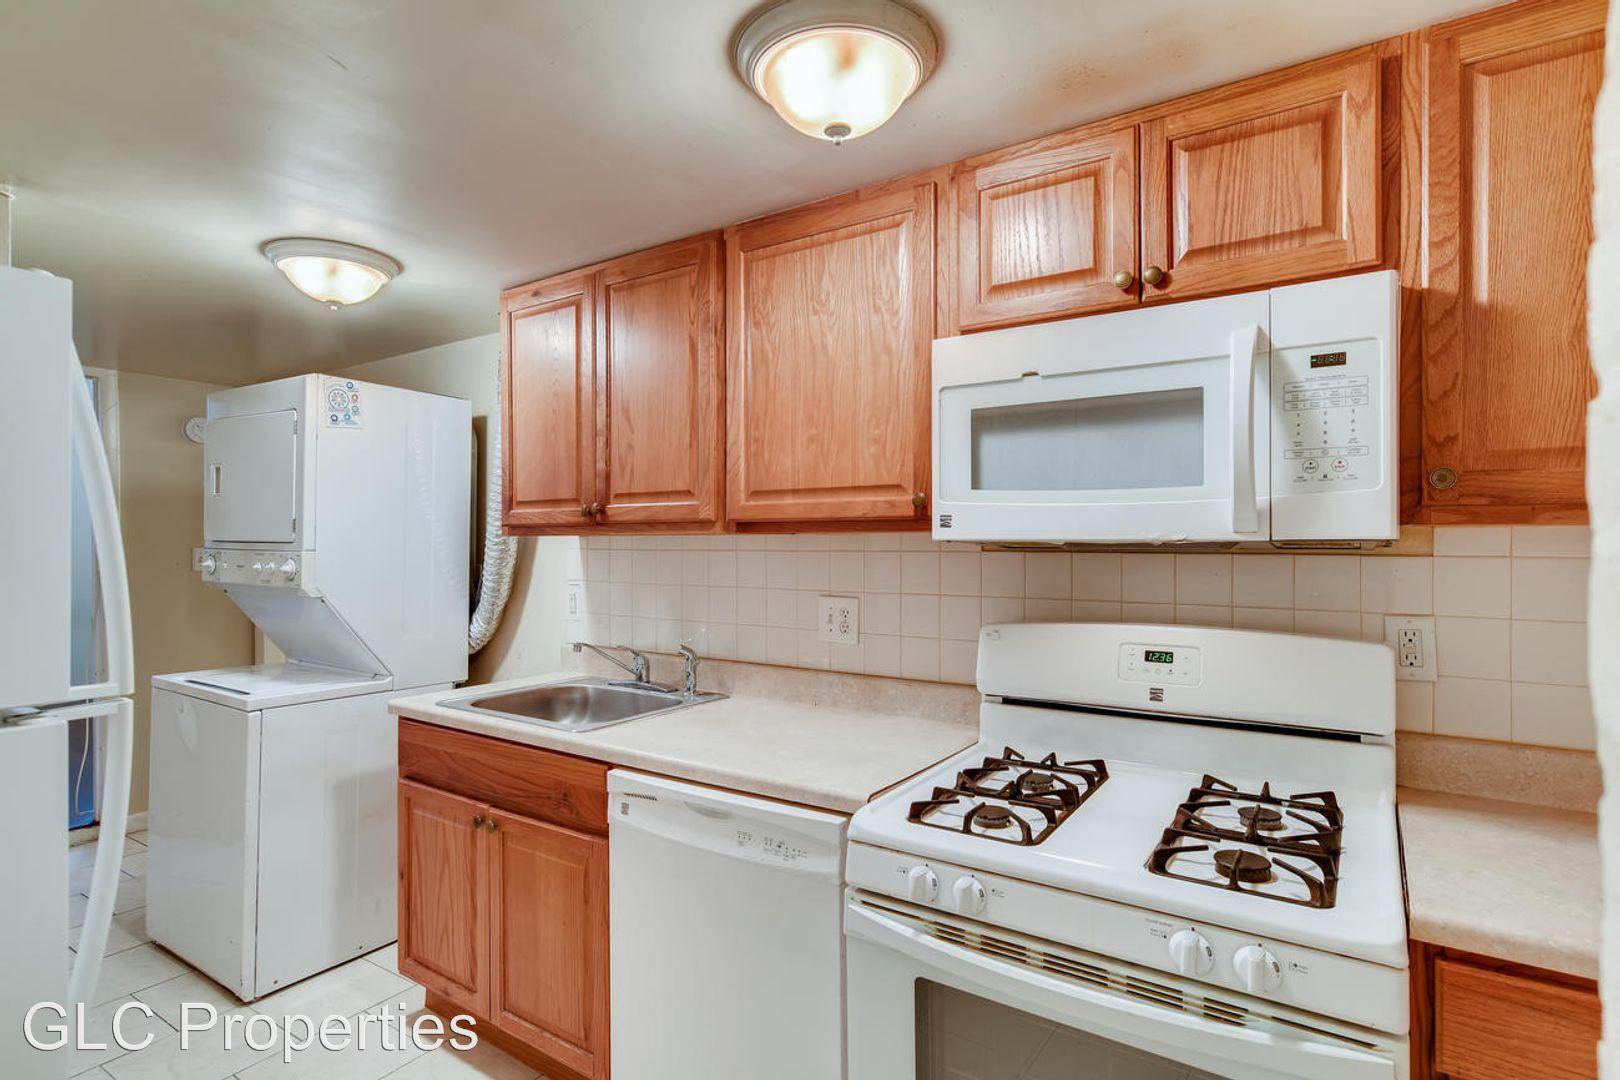 2431 Madison Ave rental